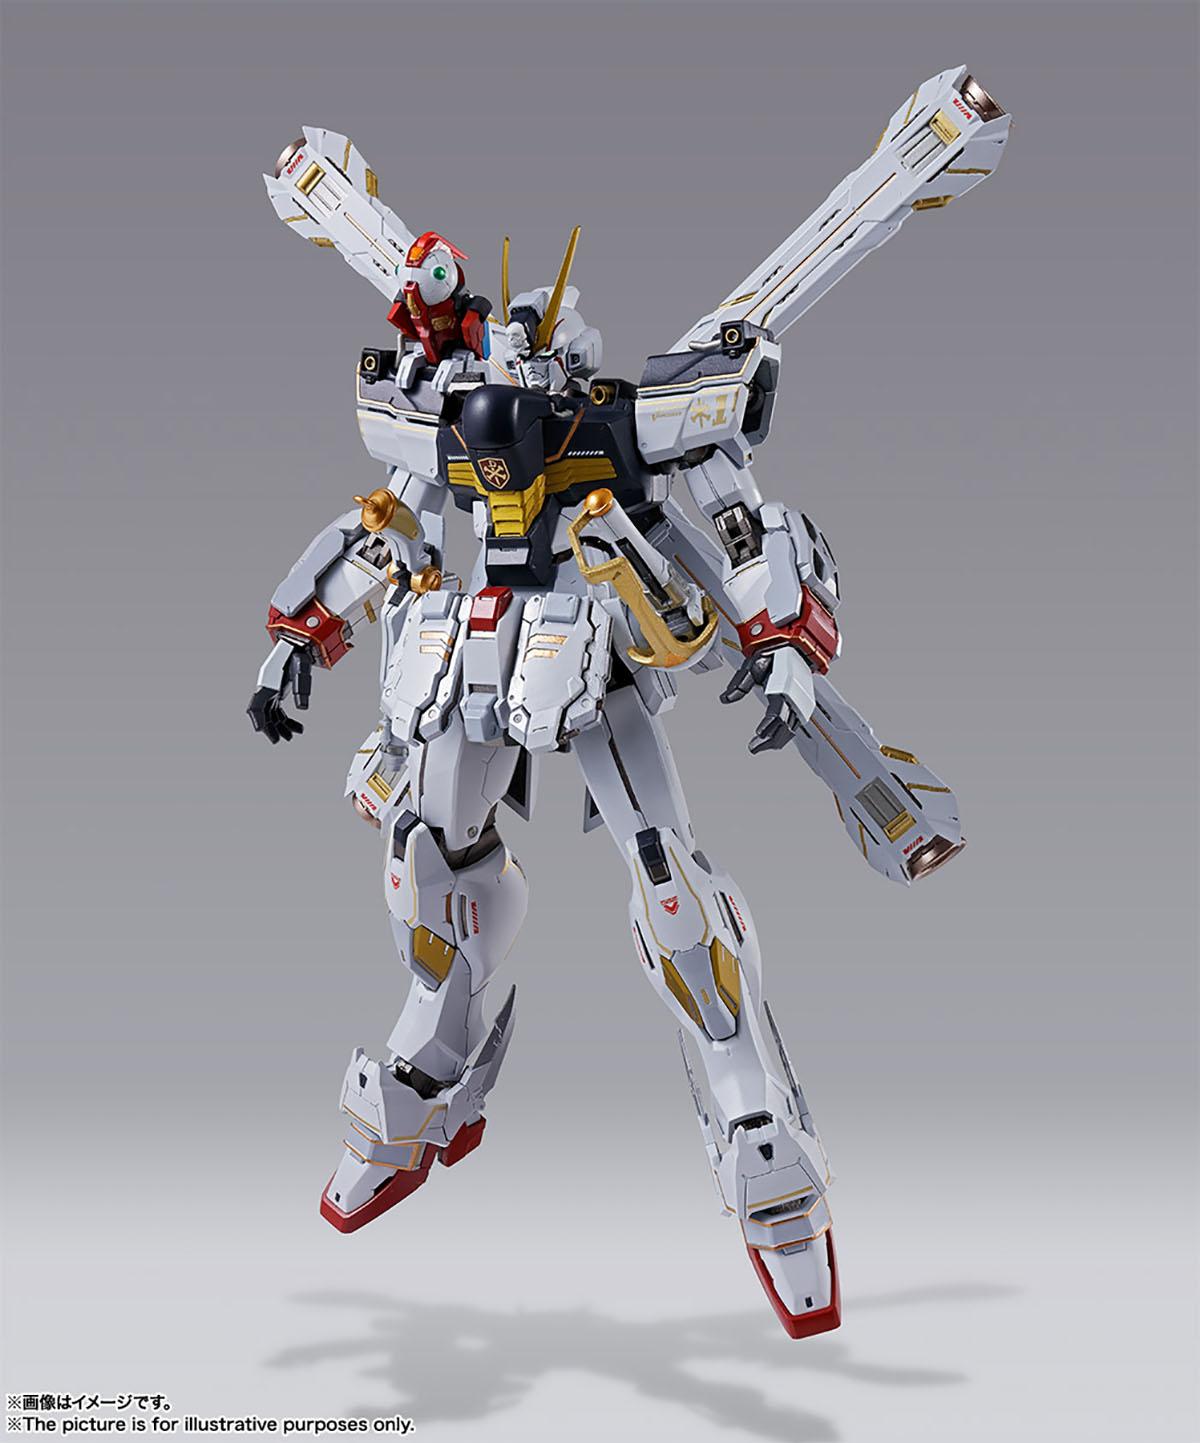 METAL BUILD『クロスボーン・ガンダムX1』機動戦士クロスボーン・ガンダム 可動フィギュア-011